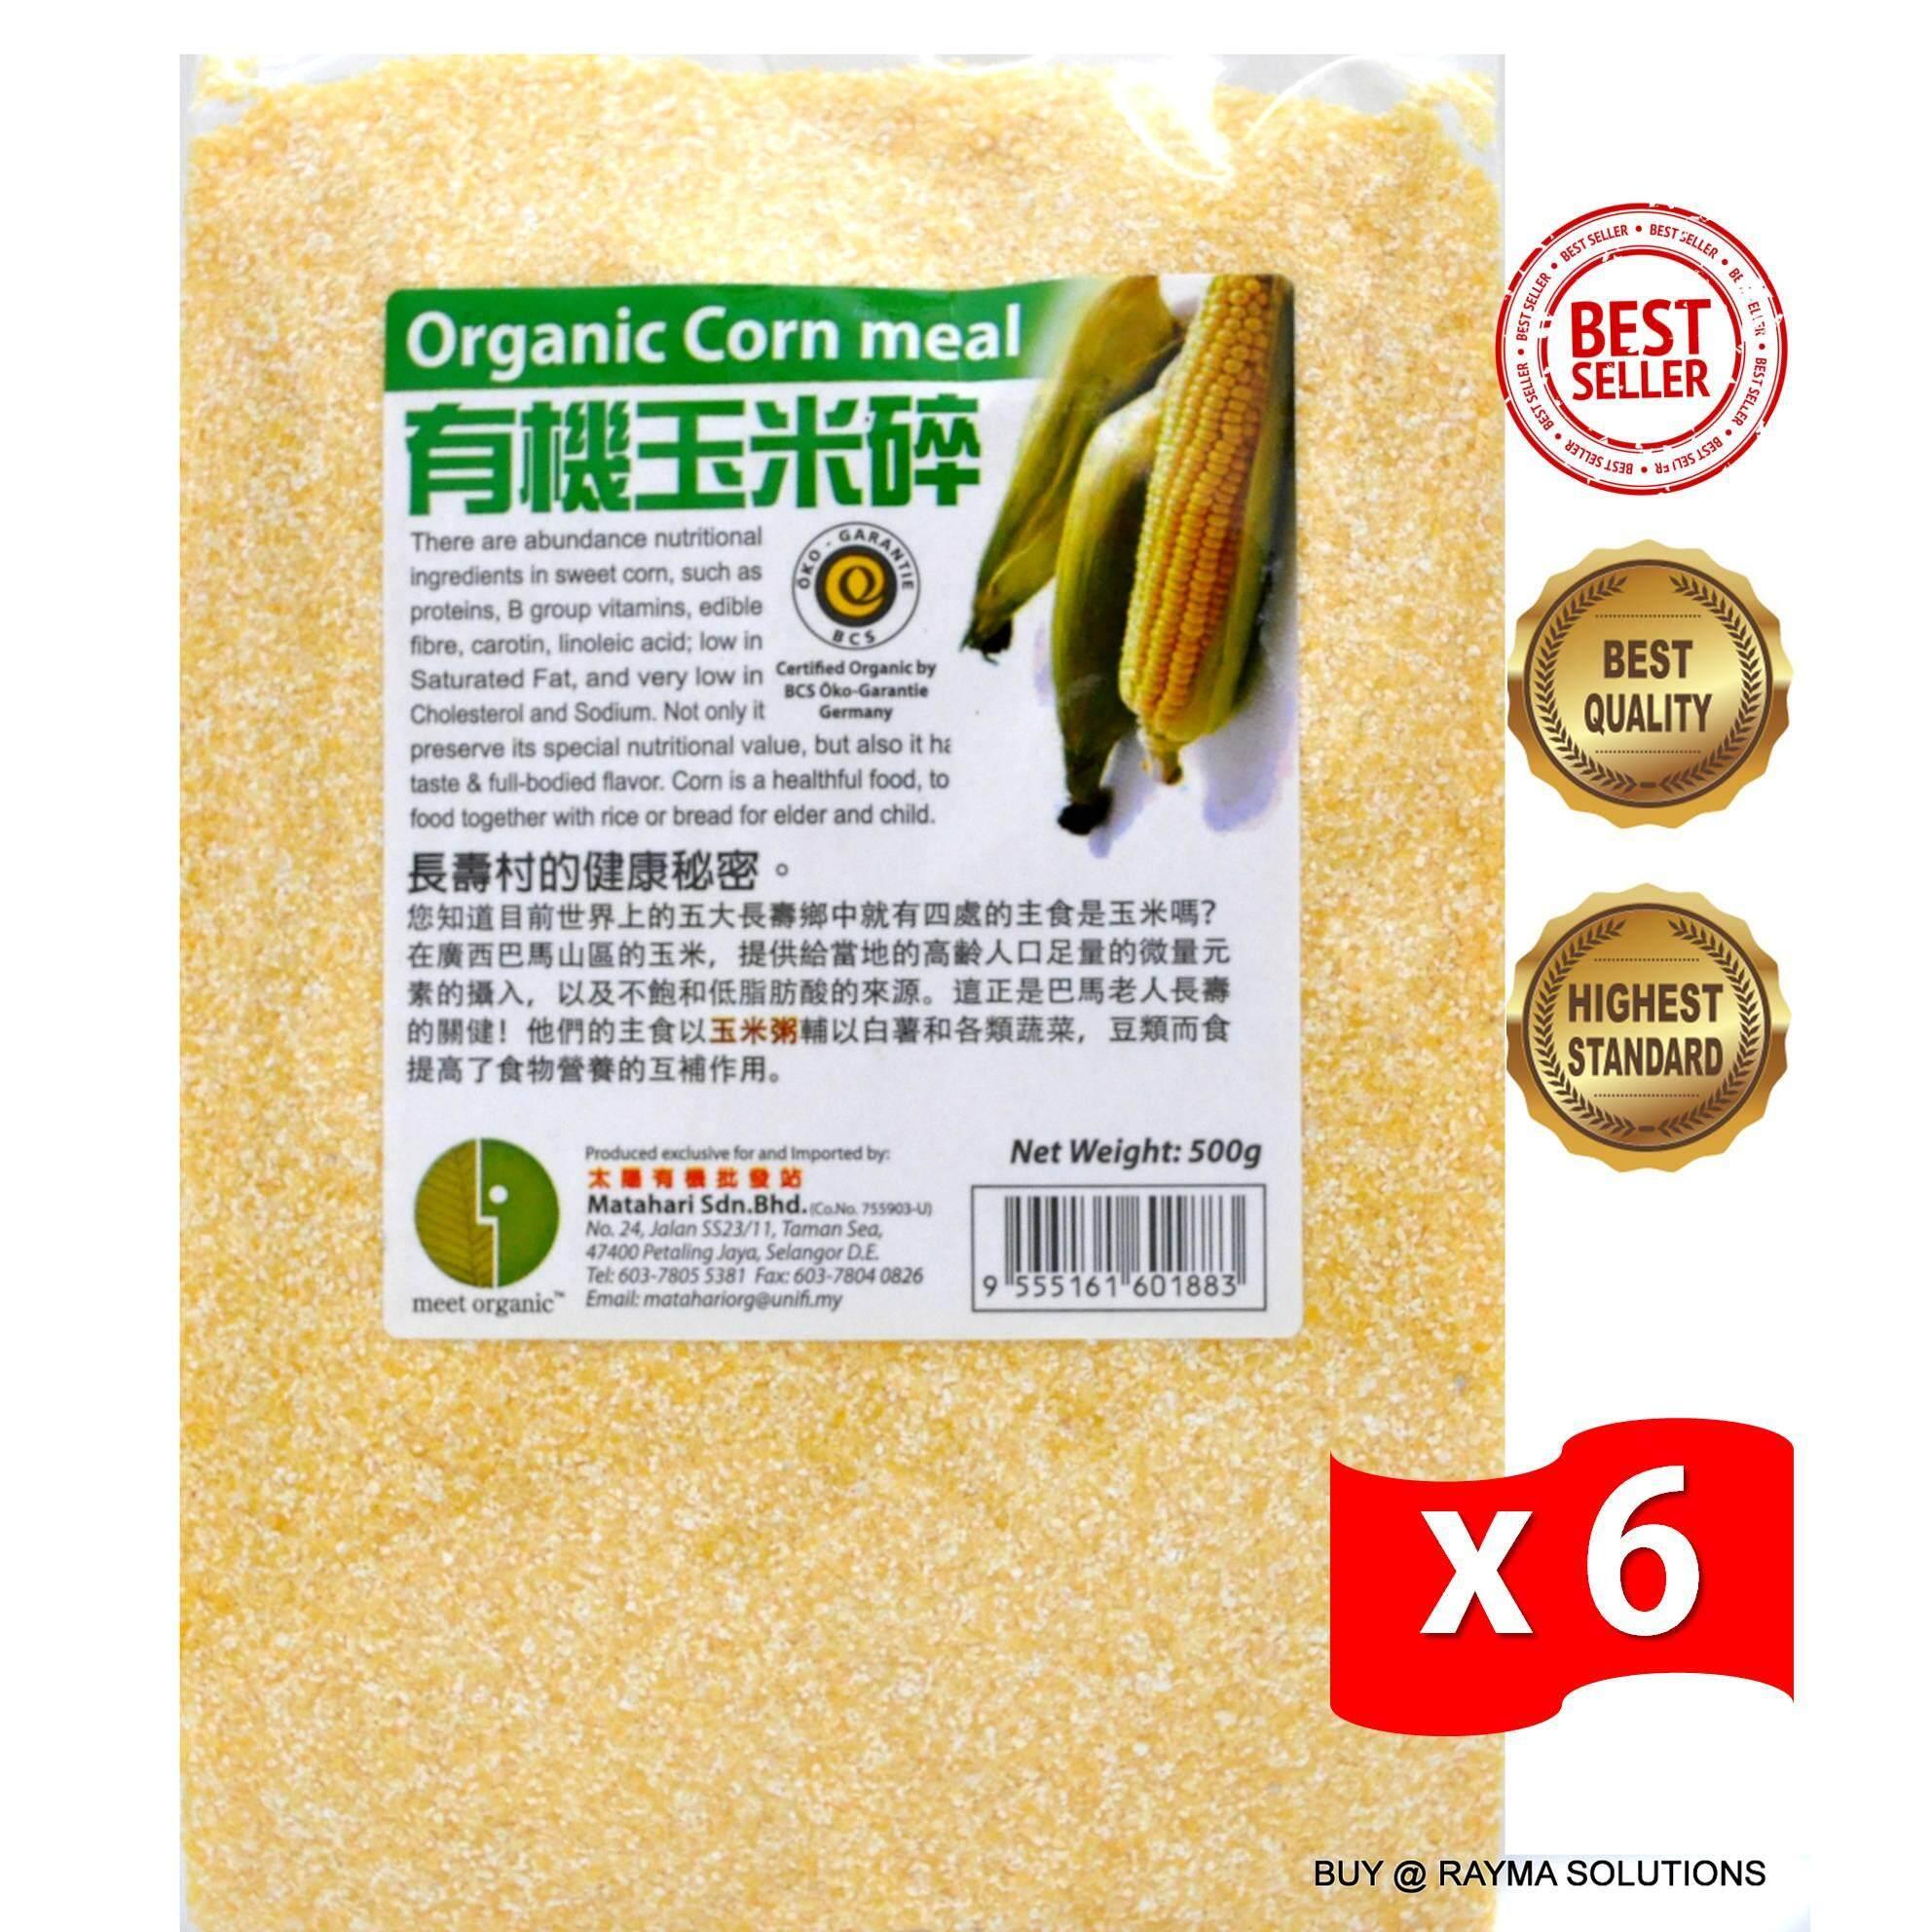 [Best Deal] MH FOOD Organic Corn Meal 500g (6 Packs)